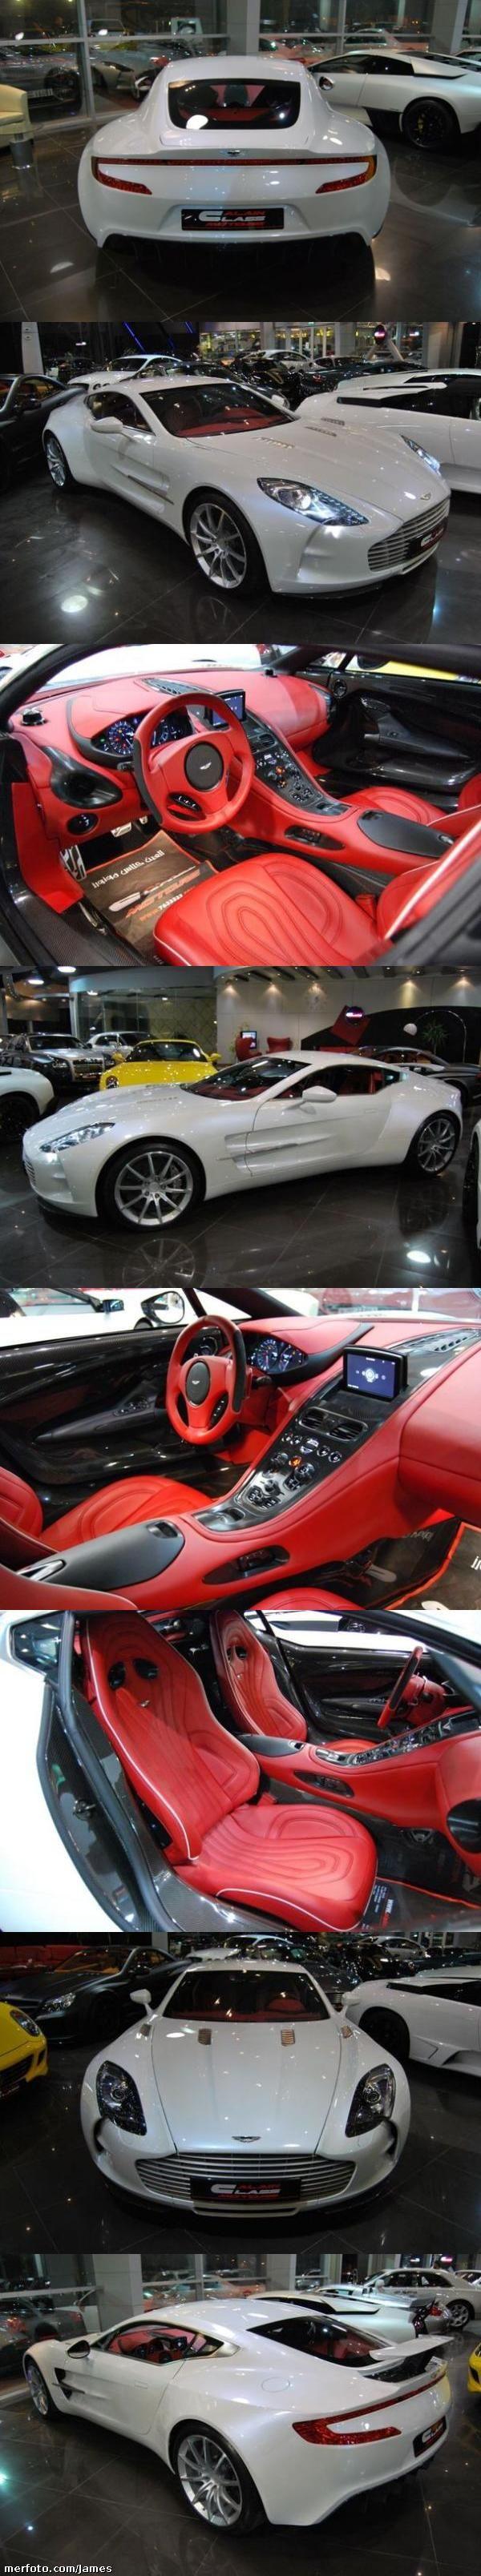 Aston Martin One-77: Muchocars Com, Astonmartin One 77, Sports Cars, One 77 Aston, Dream Cars, Martin One77, Red Interiors, Dreams Cars, Aston Martin